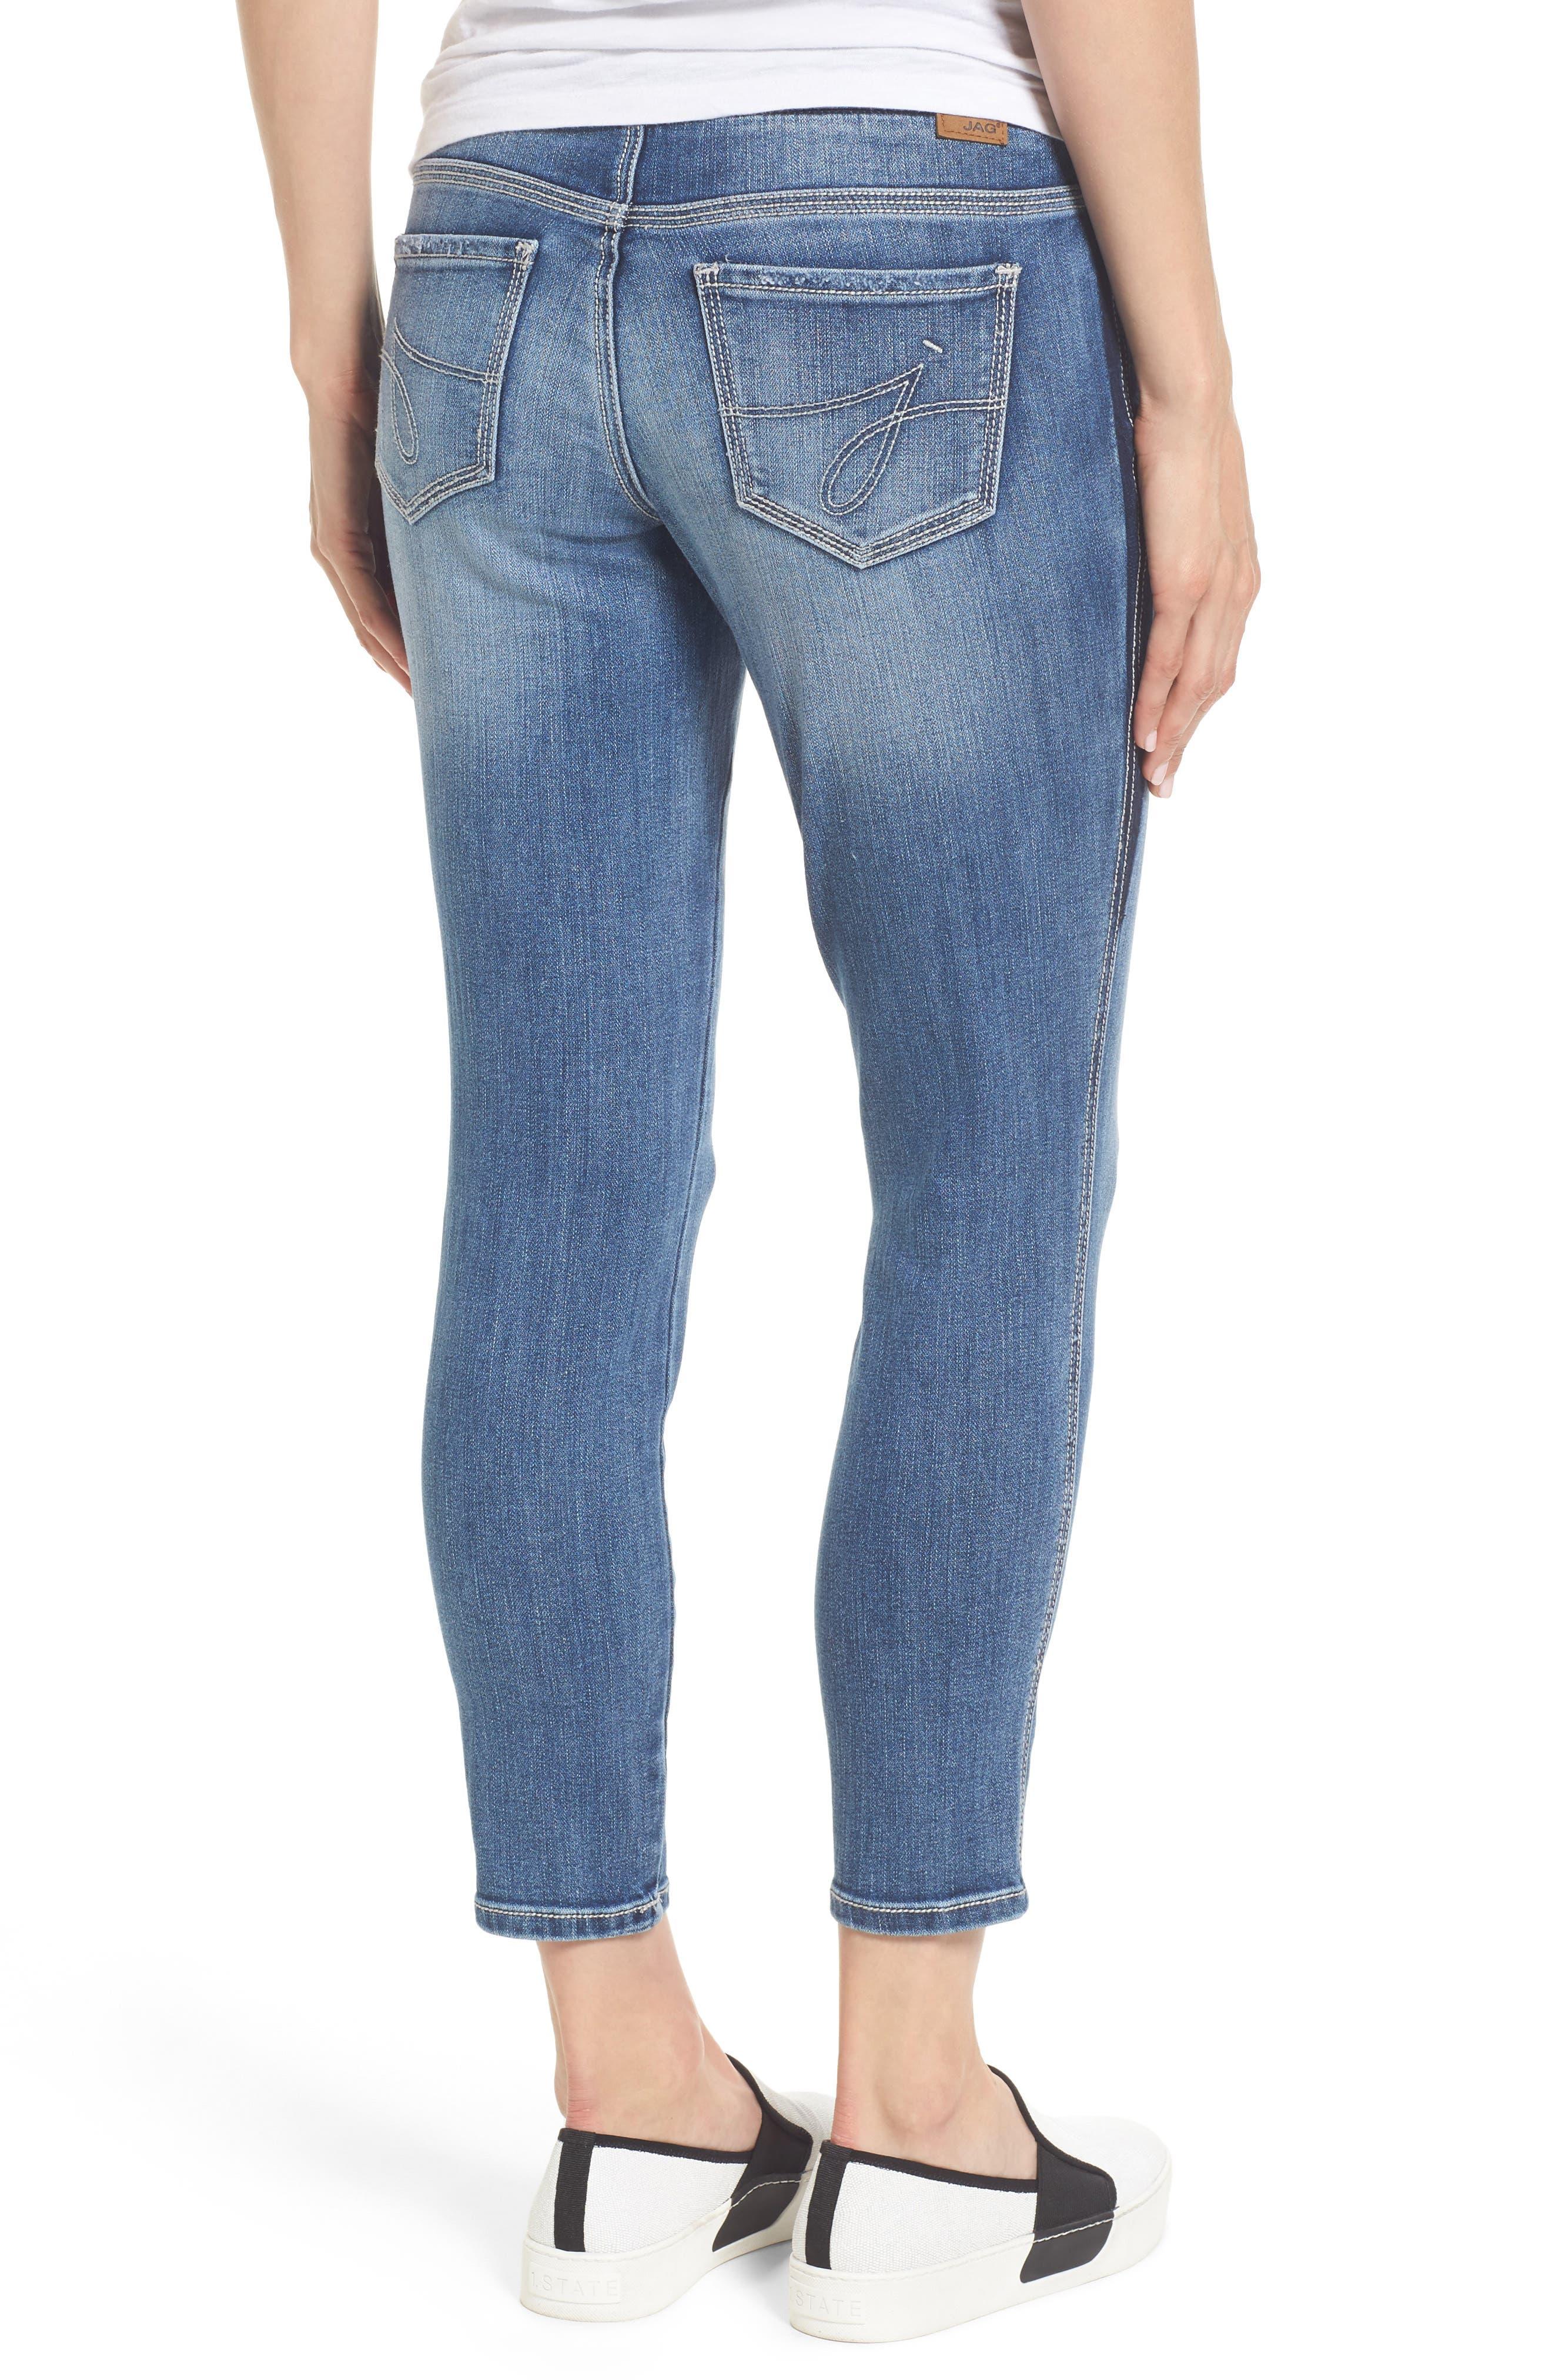 Alternate Image 2  - Jag Jeans Nora Marta Stretch Skinny Jeans (River Wash)